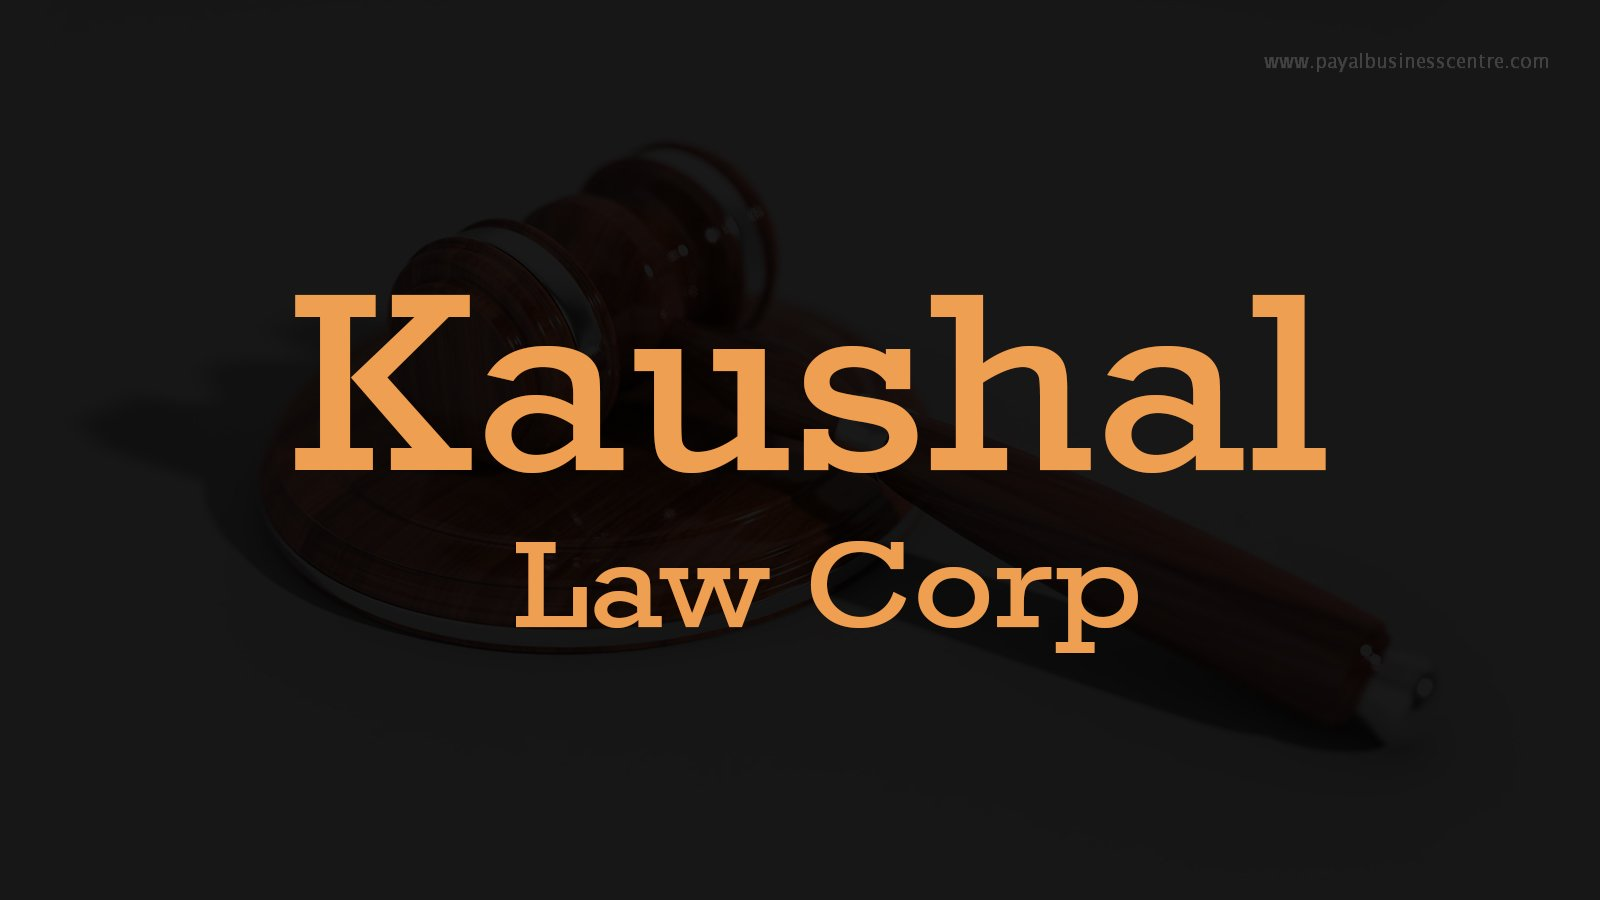 Kaushal Law Corp